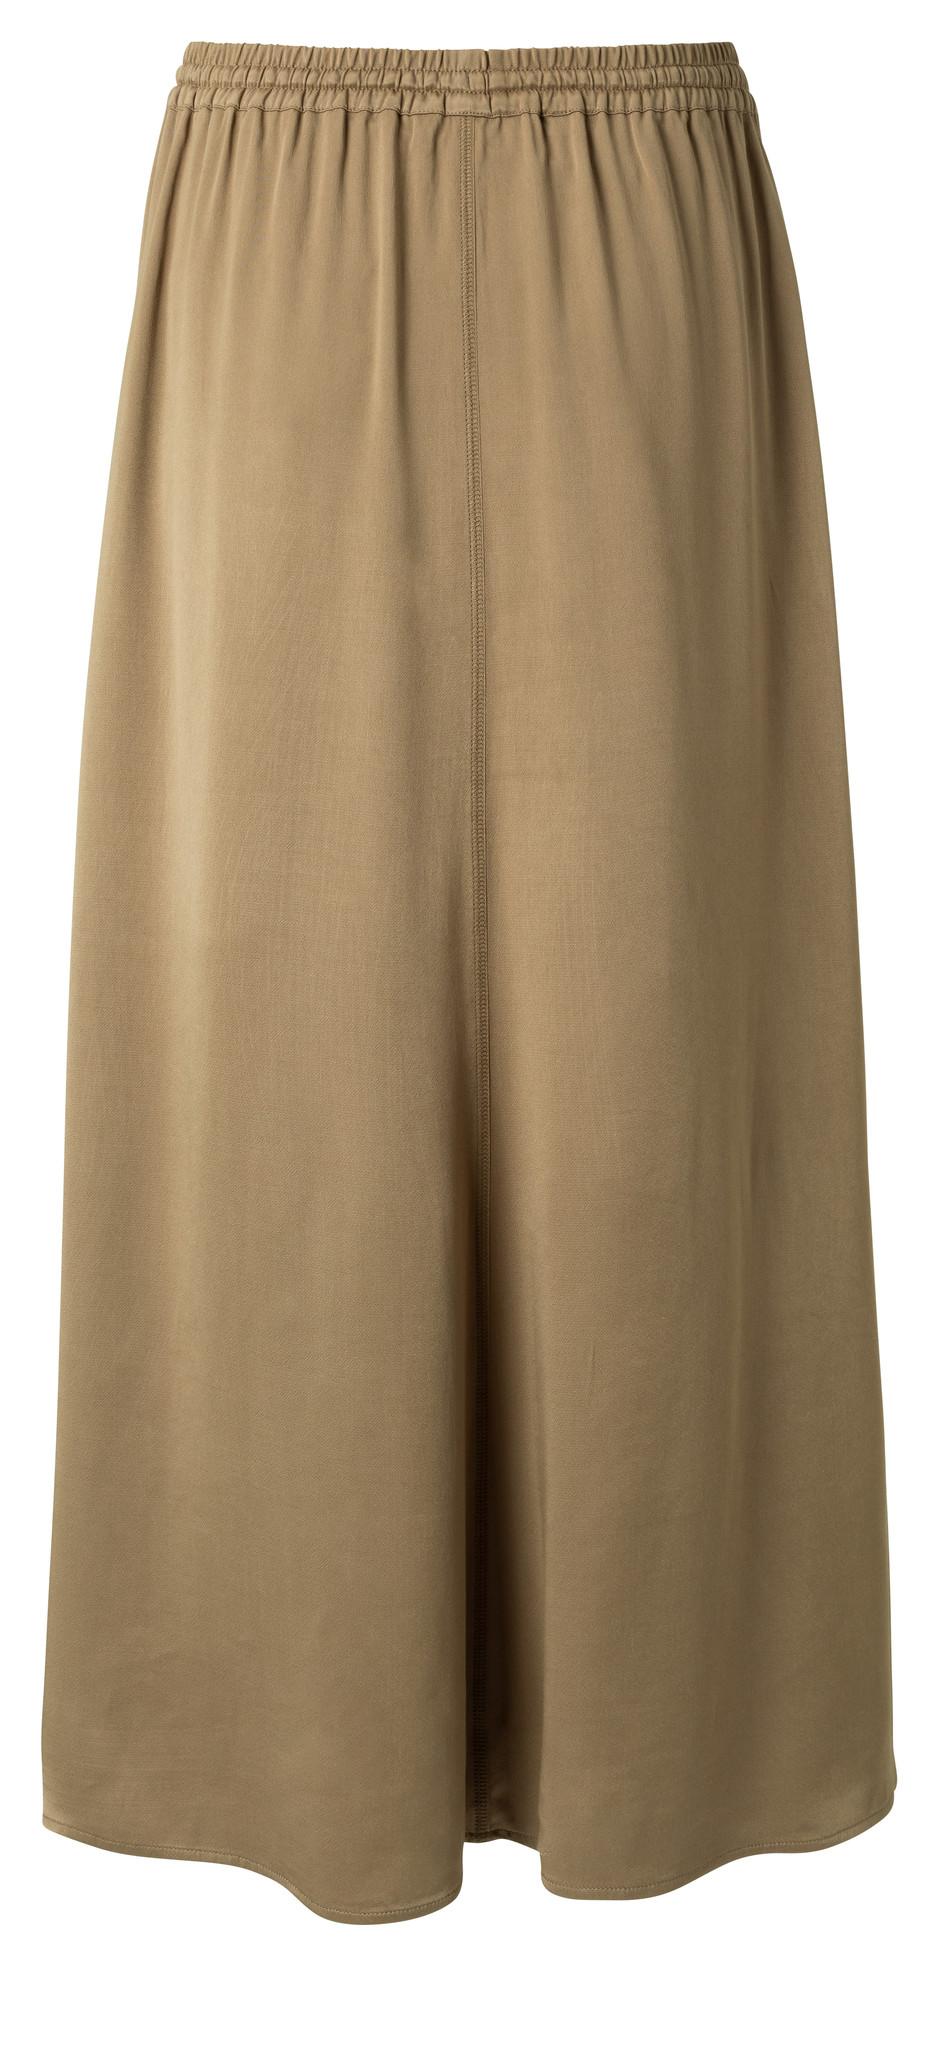 yaya Satin skirt elastic 1401134-113-3